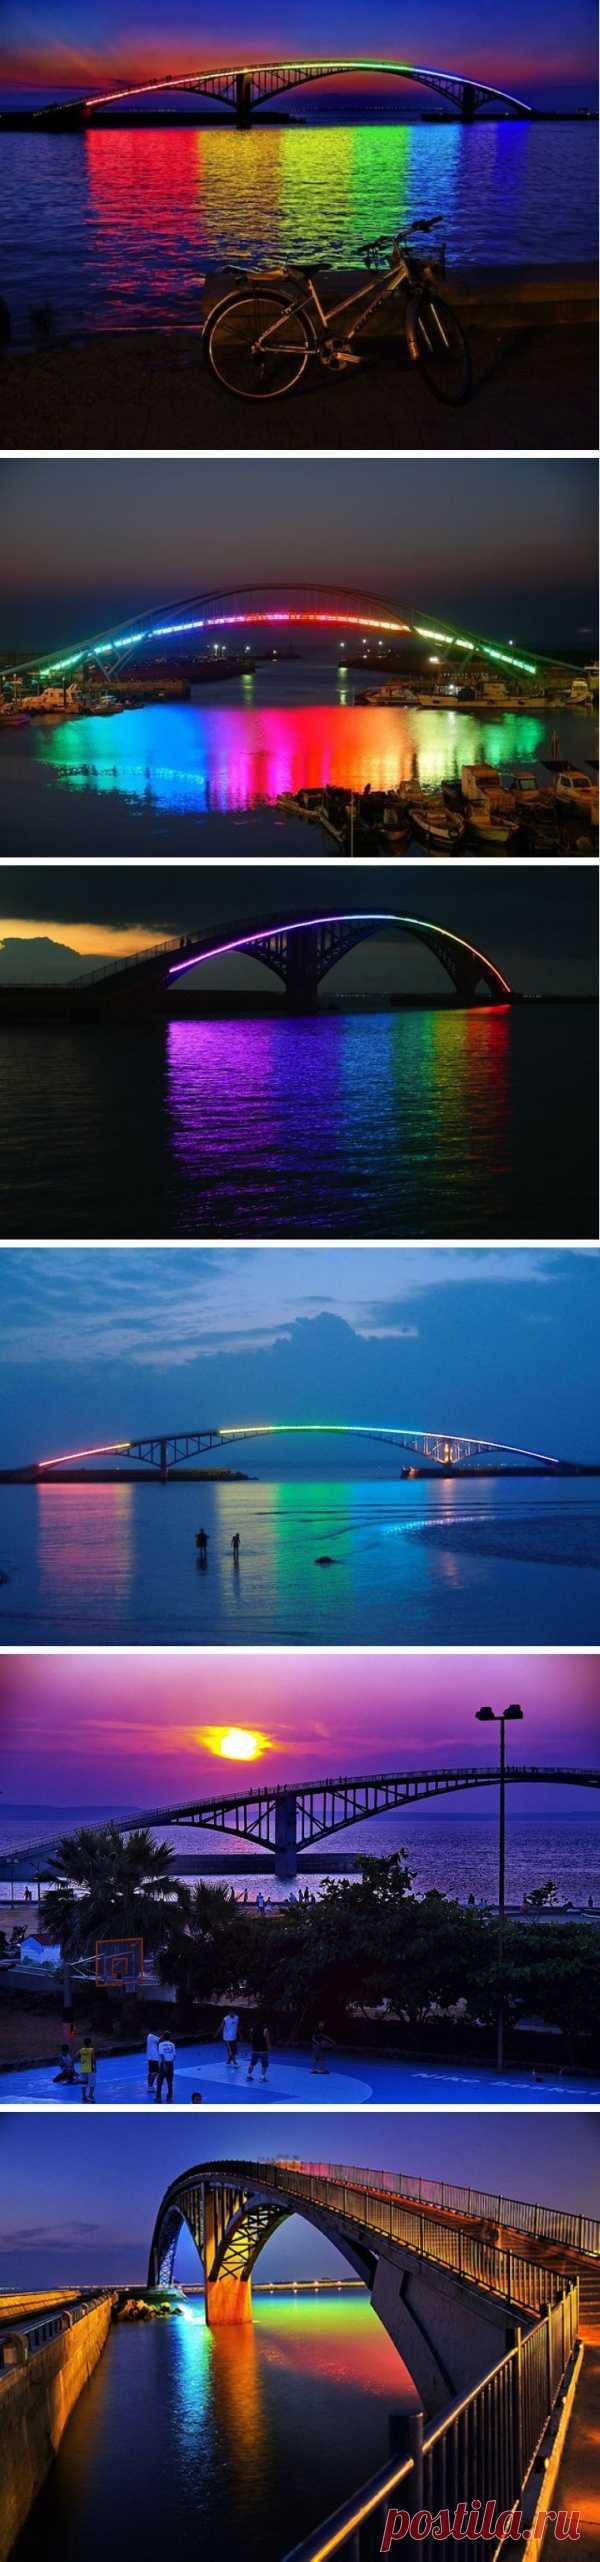 Ночная сказка. Радужный мост. Магонга, Тайвань